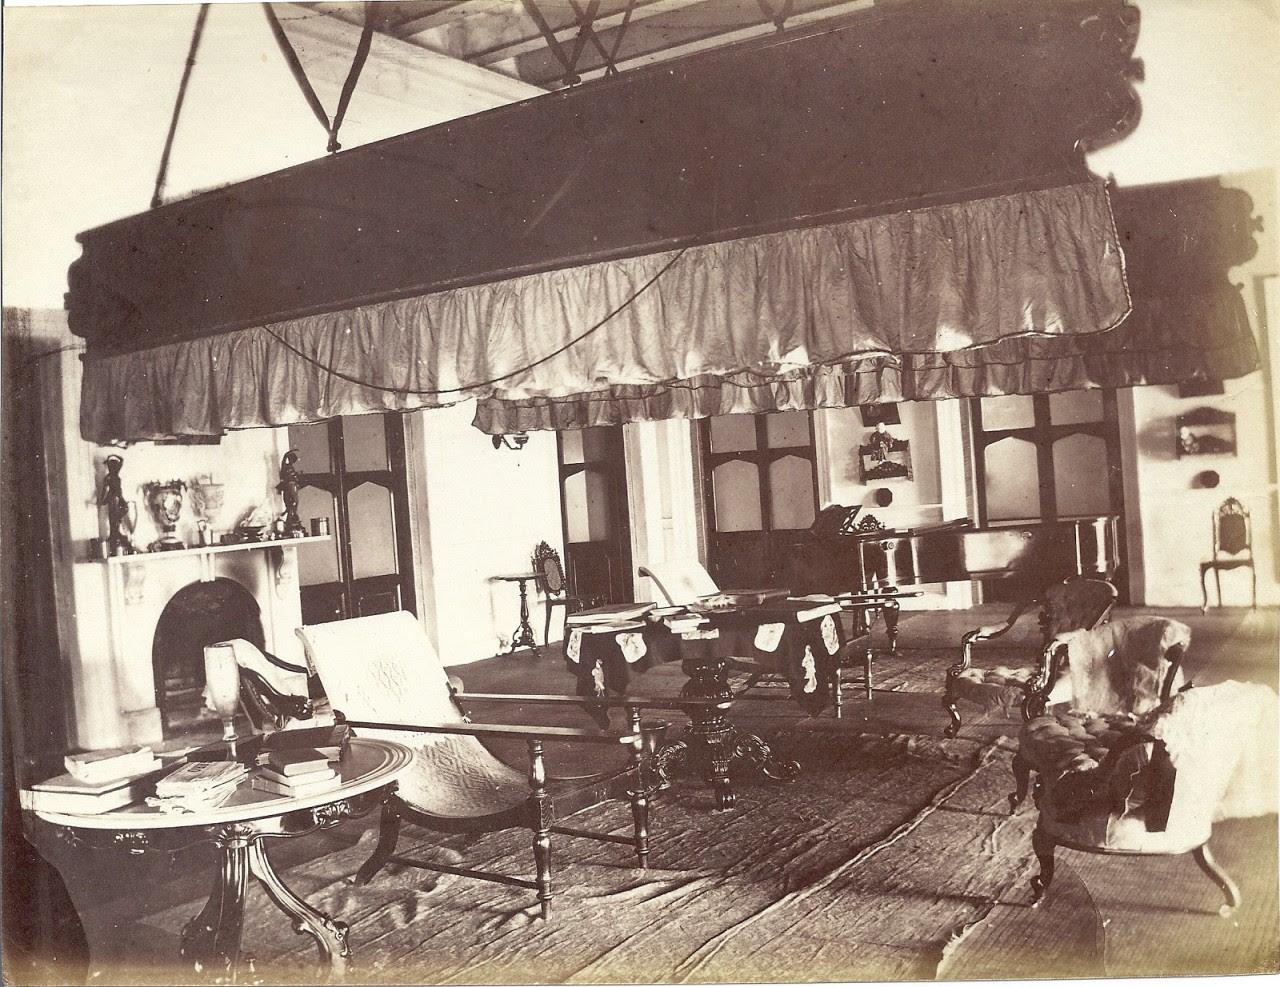 http://www.columbia.edu/itc/mealac/pritchett/00routesdata/1800_1899/britishrule/incountry/chandannagar1870.jpg